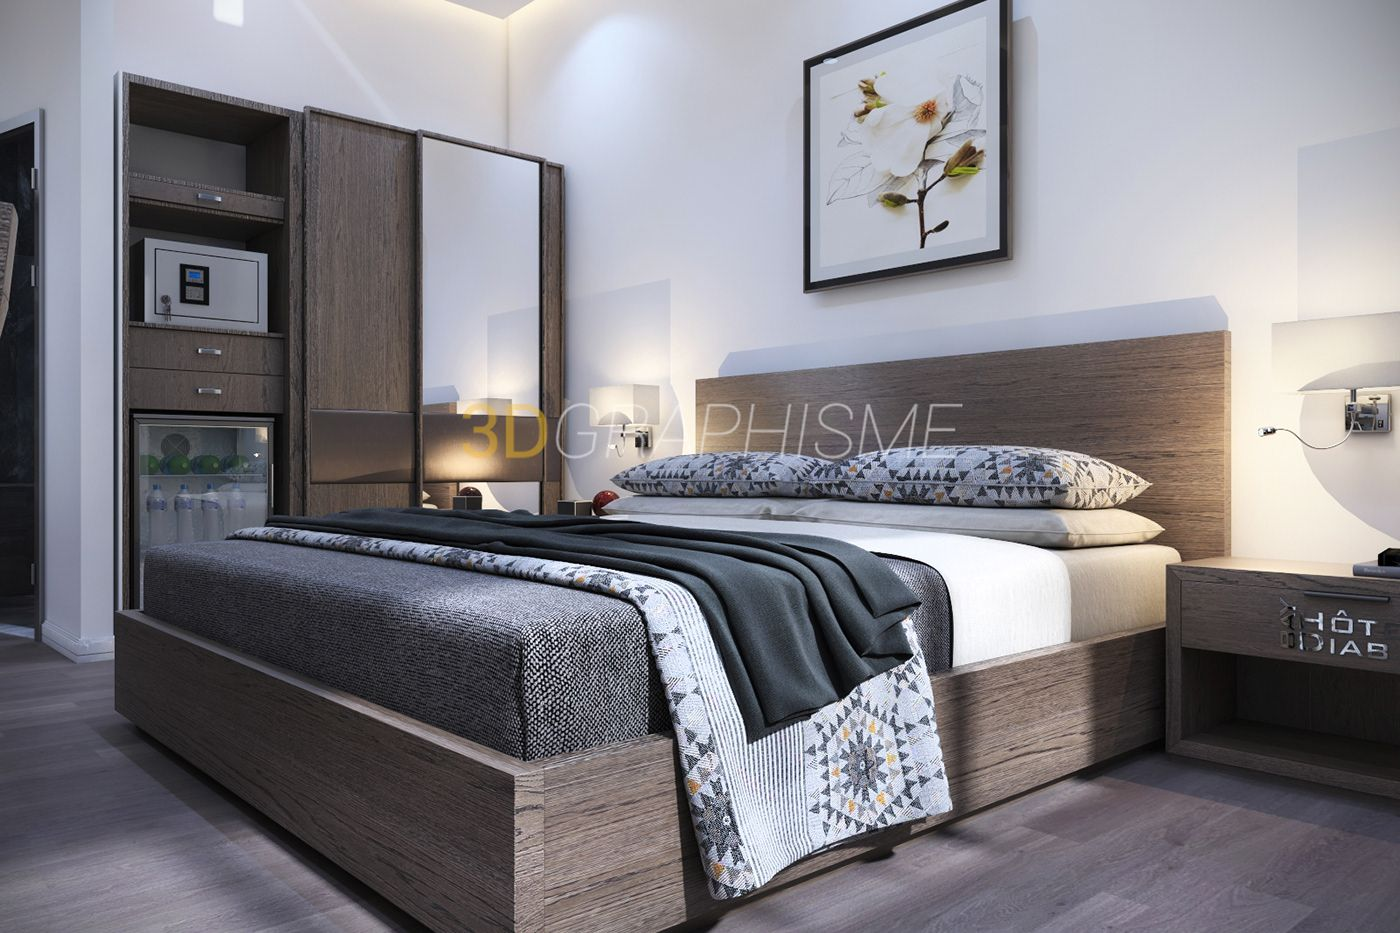 Design Furniture Bab Ezzouar bedroom hotel - bay diab on behance